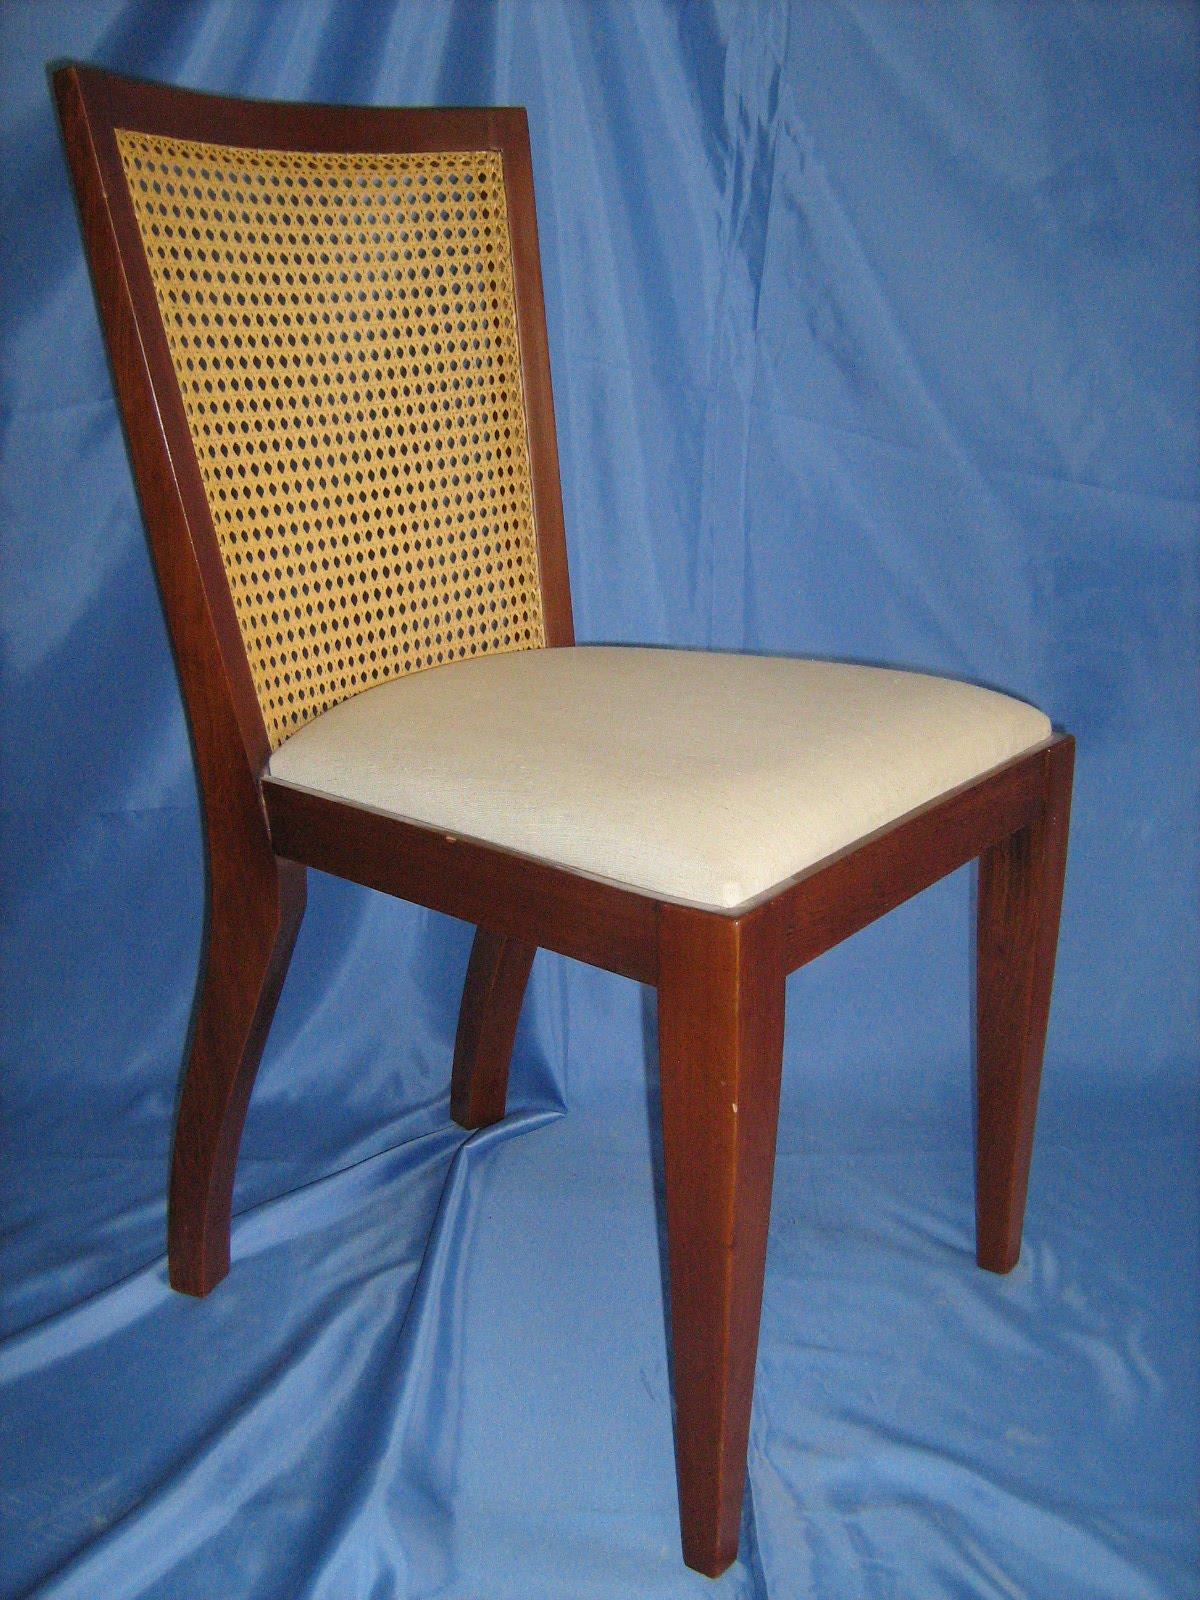 Sala de Jantar cadeira jantar cadeiras jantar cadeiras fabrica de  #653225 1200x1600